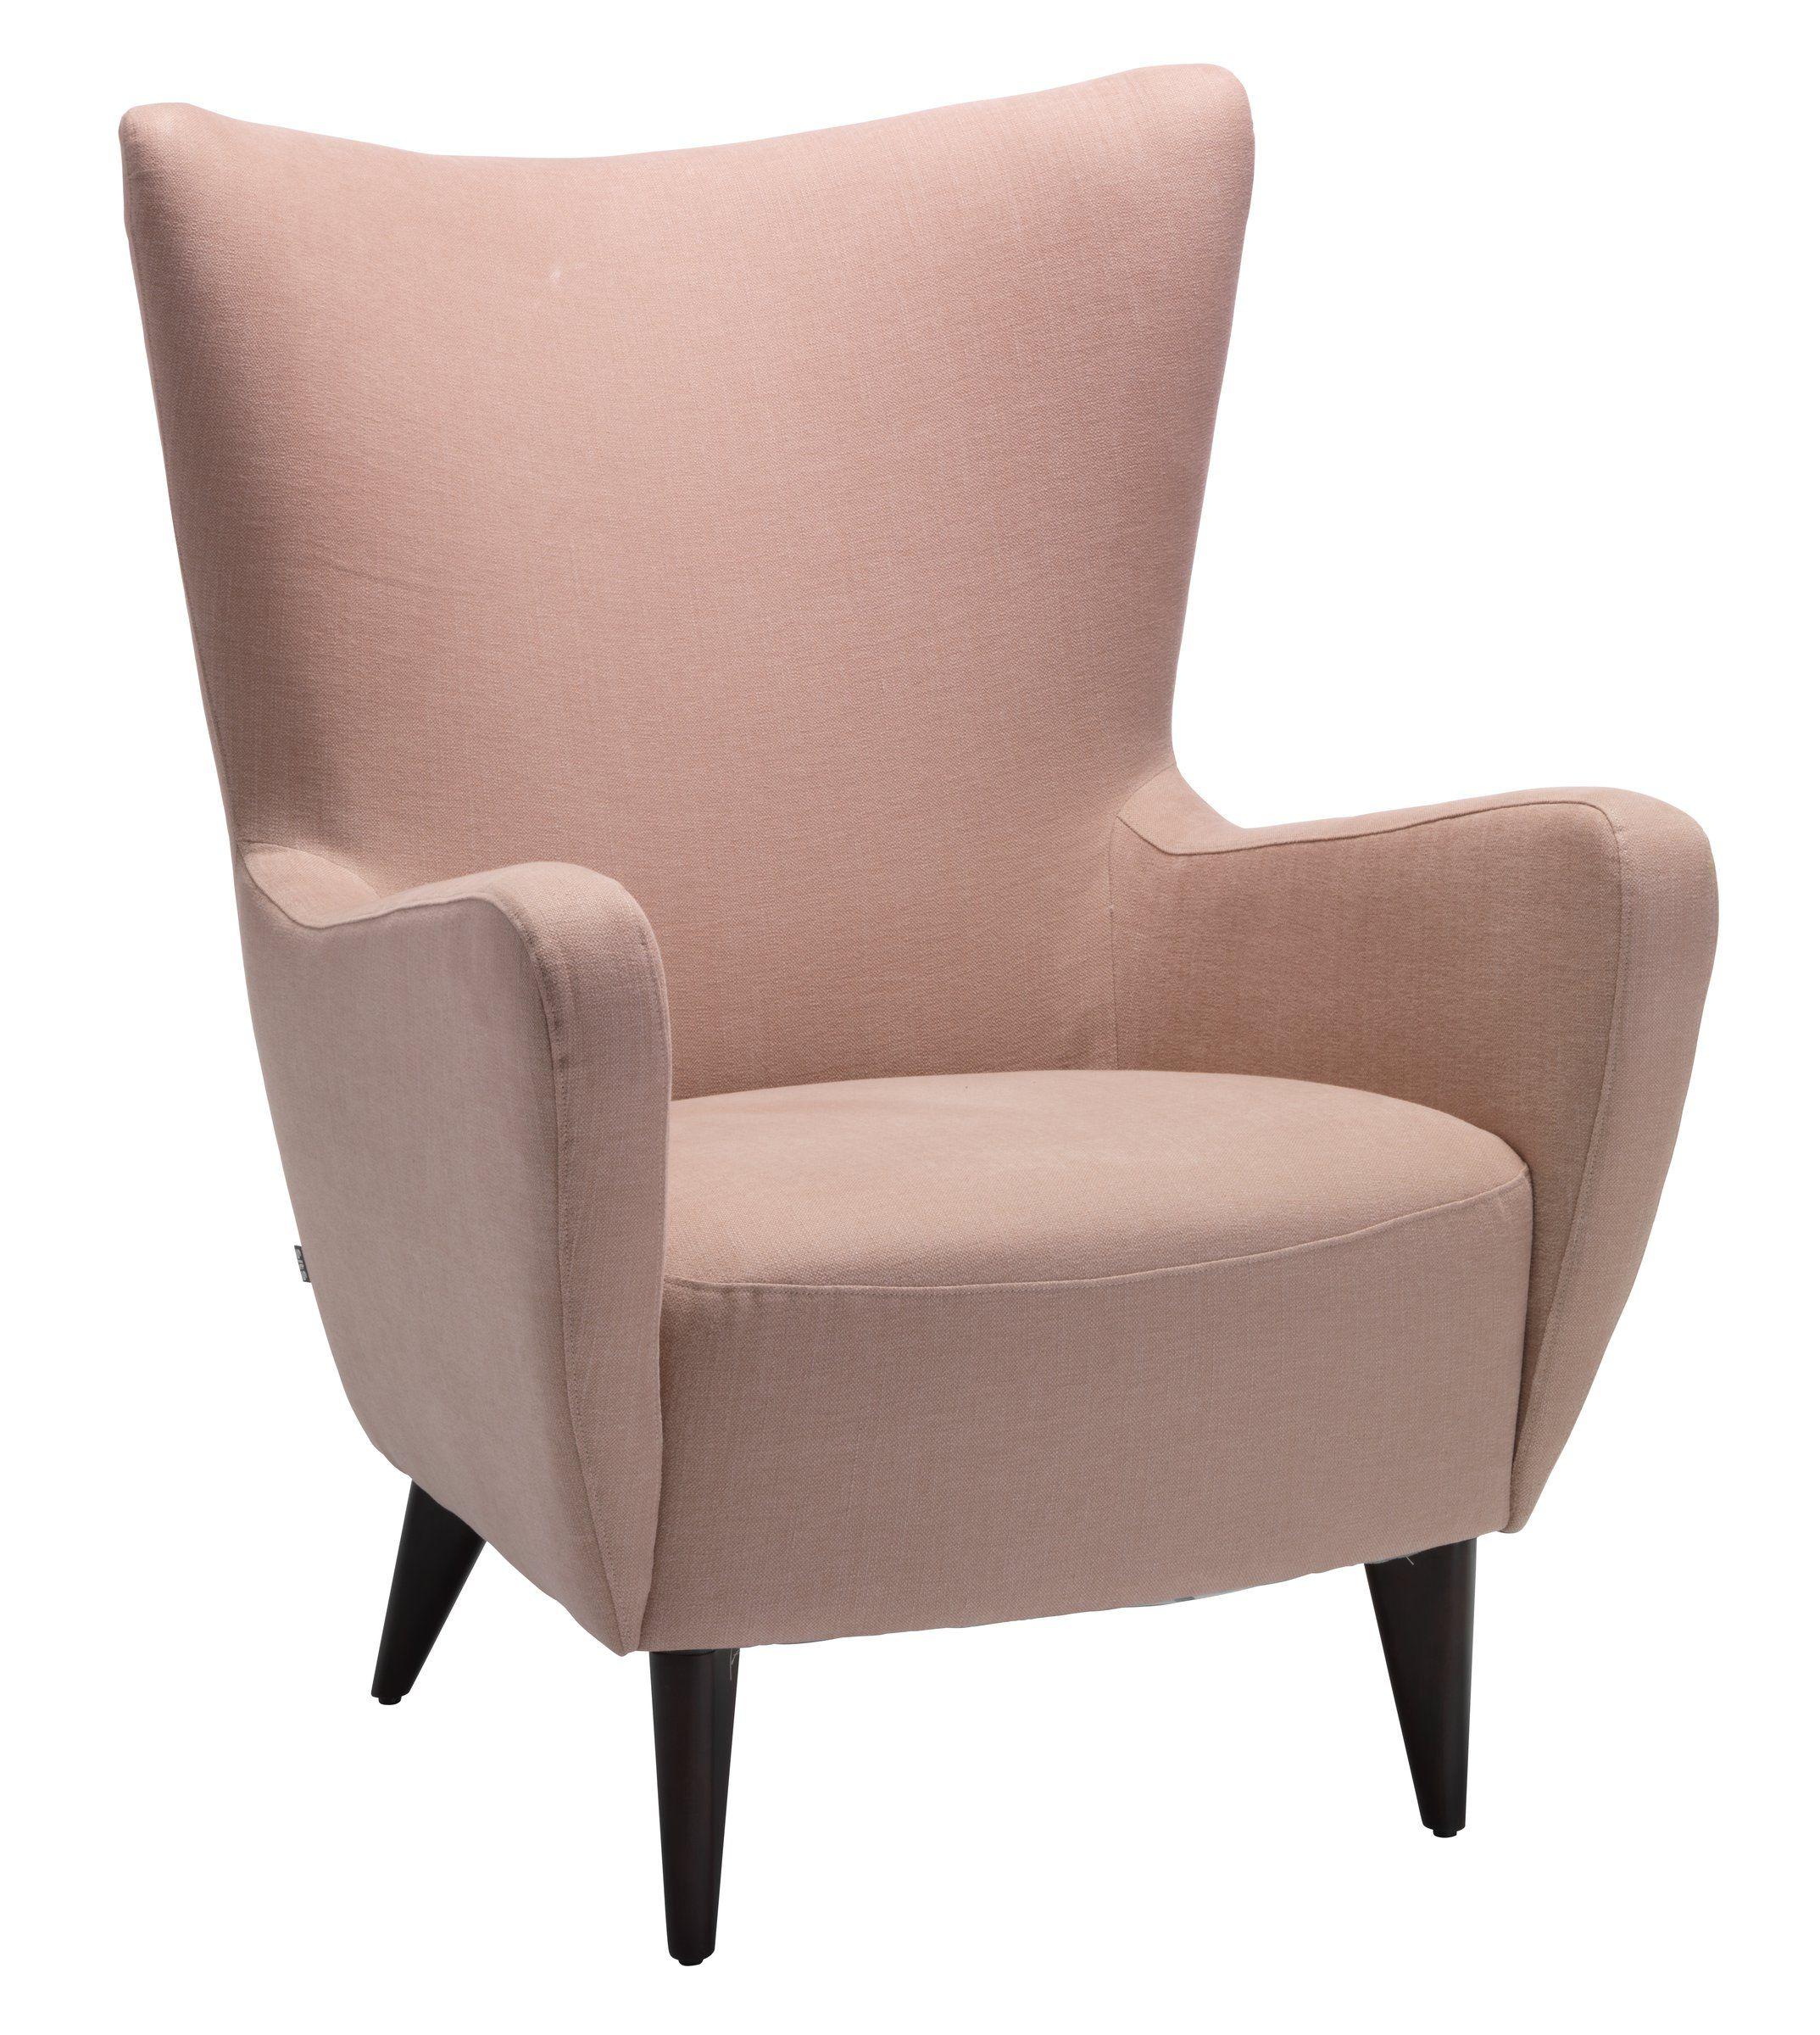 sessel micasa williamflooring. Black Bedroom Furniture Sets. Home Design Ideas